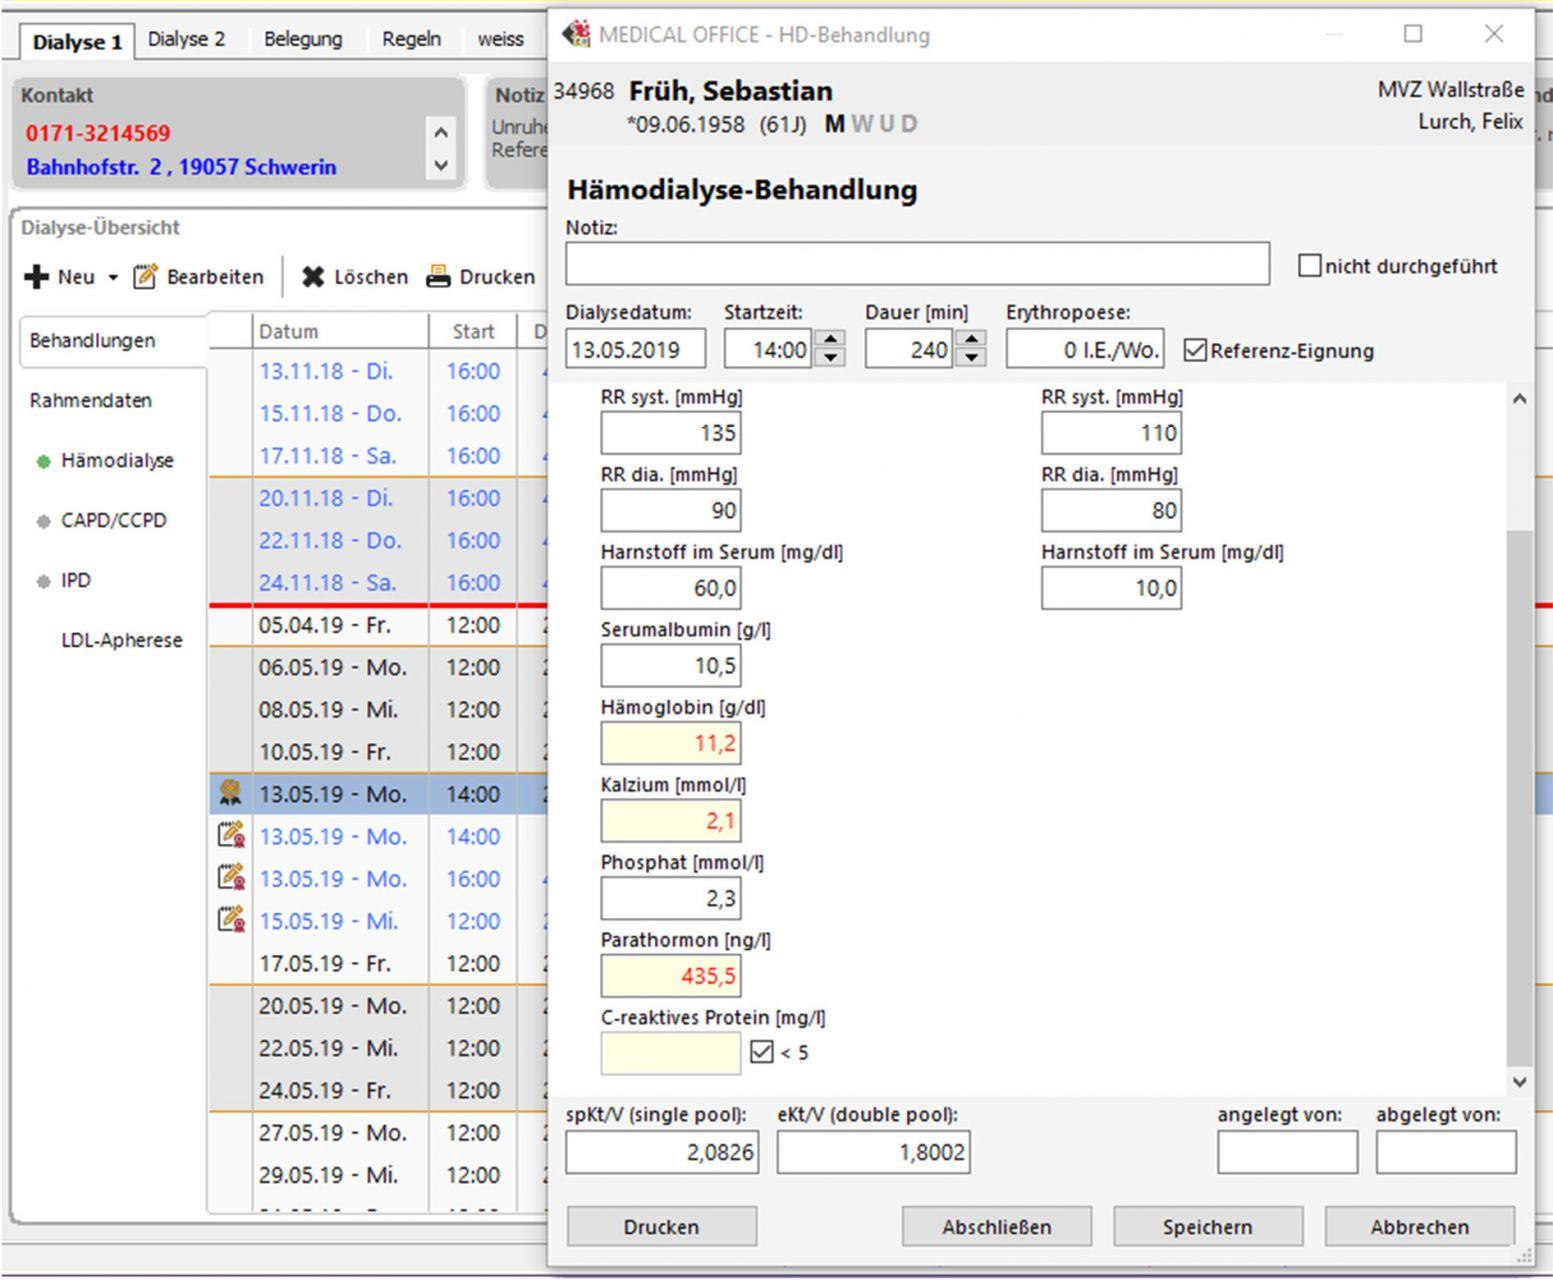 Praxissoftware Dialyse Dokumentation von Hämodialysen, Peritonealdialysen MEDICAL OFFICE